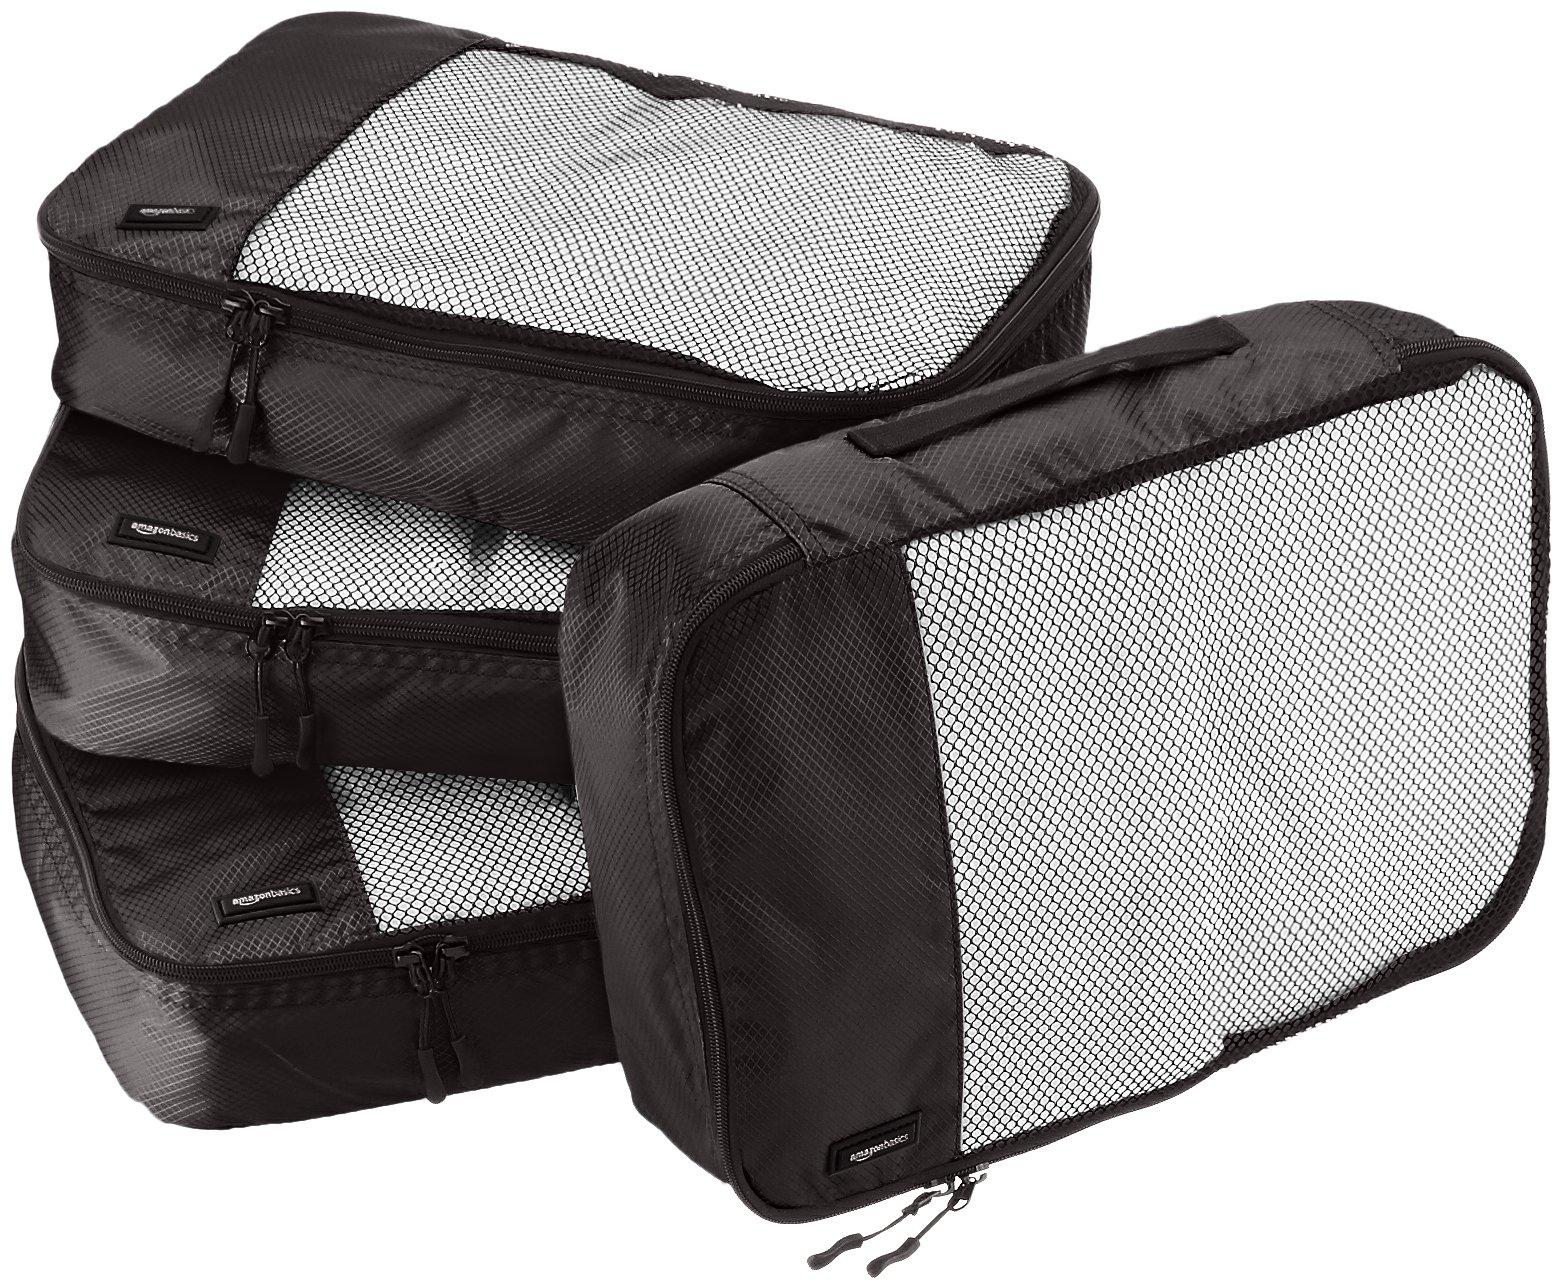 AmazonBasics Piece Packing Travel Organizer